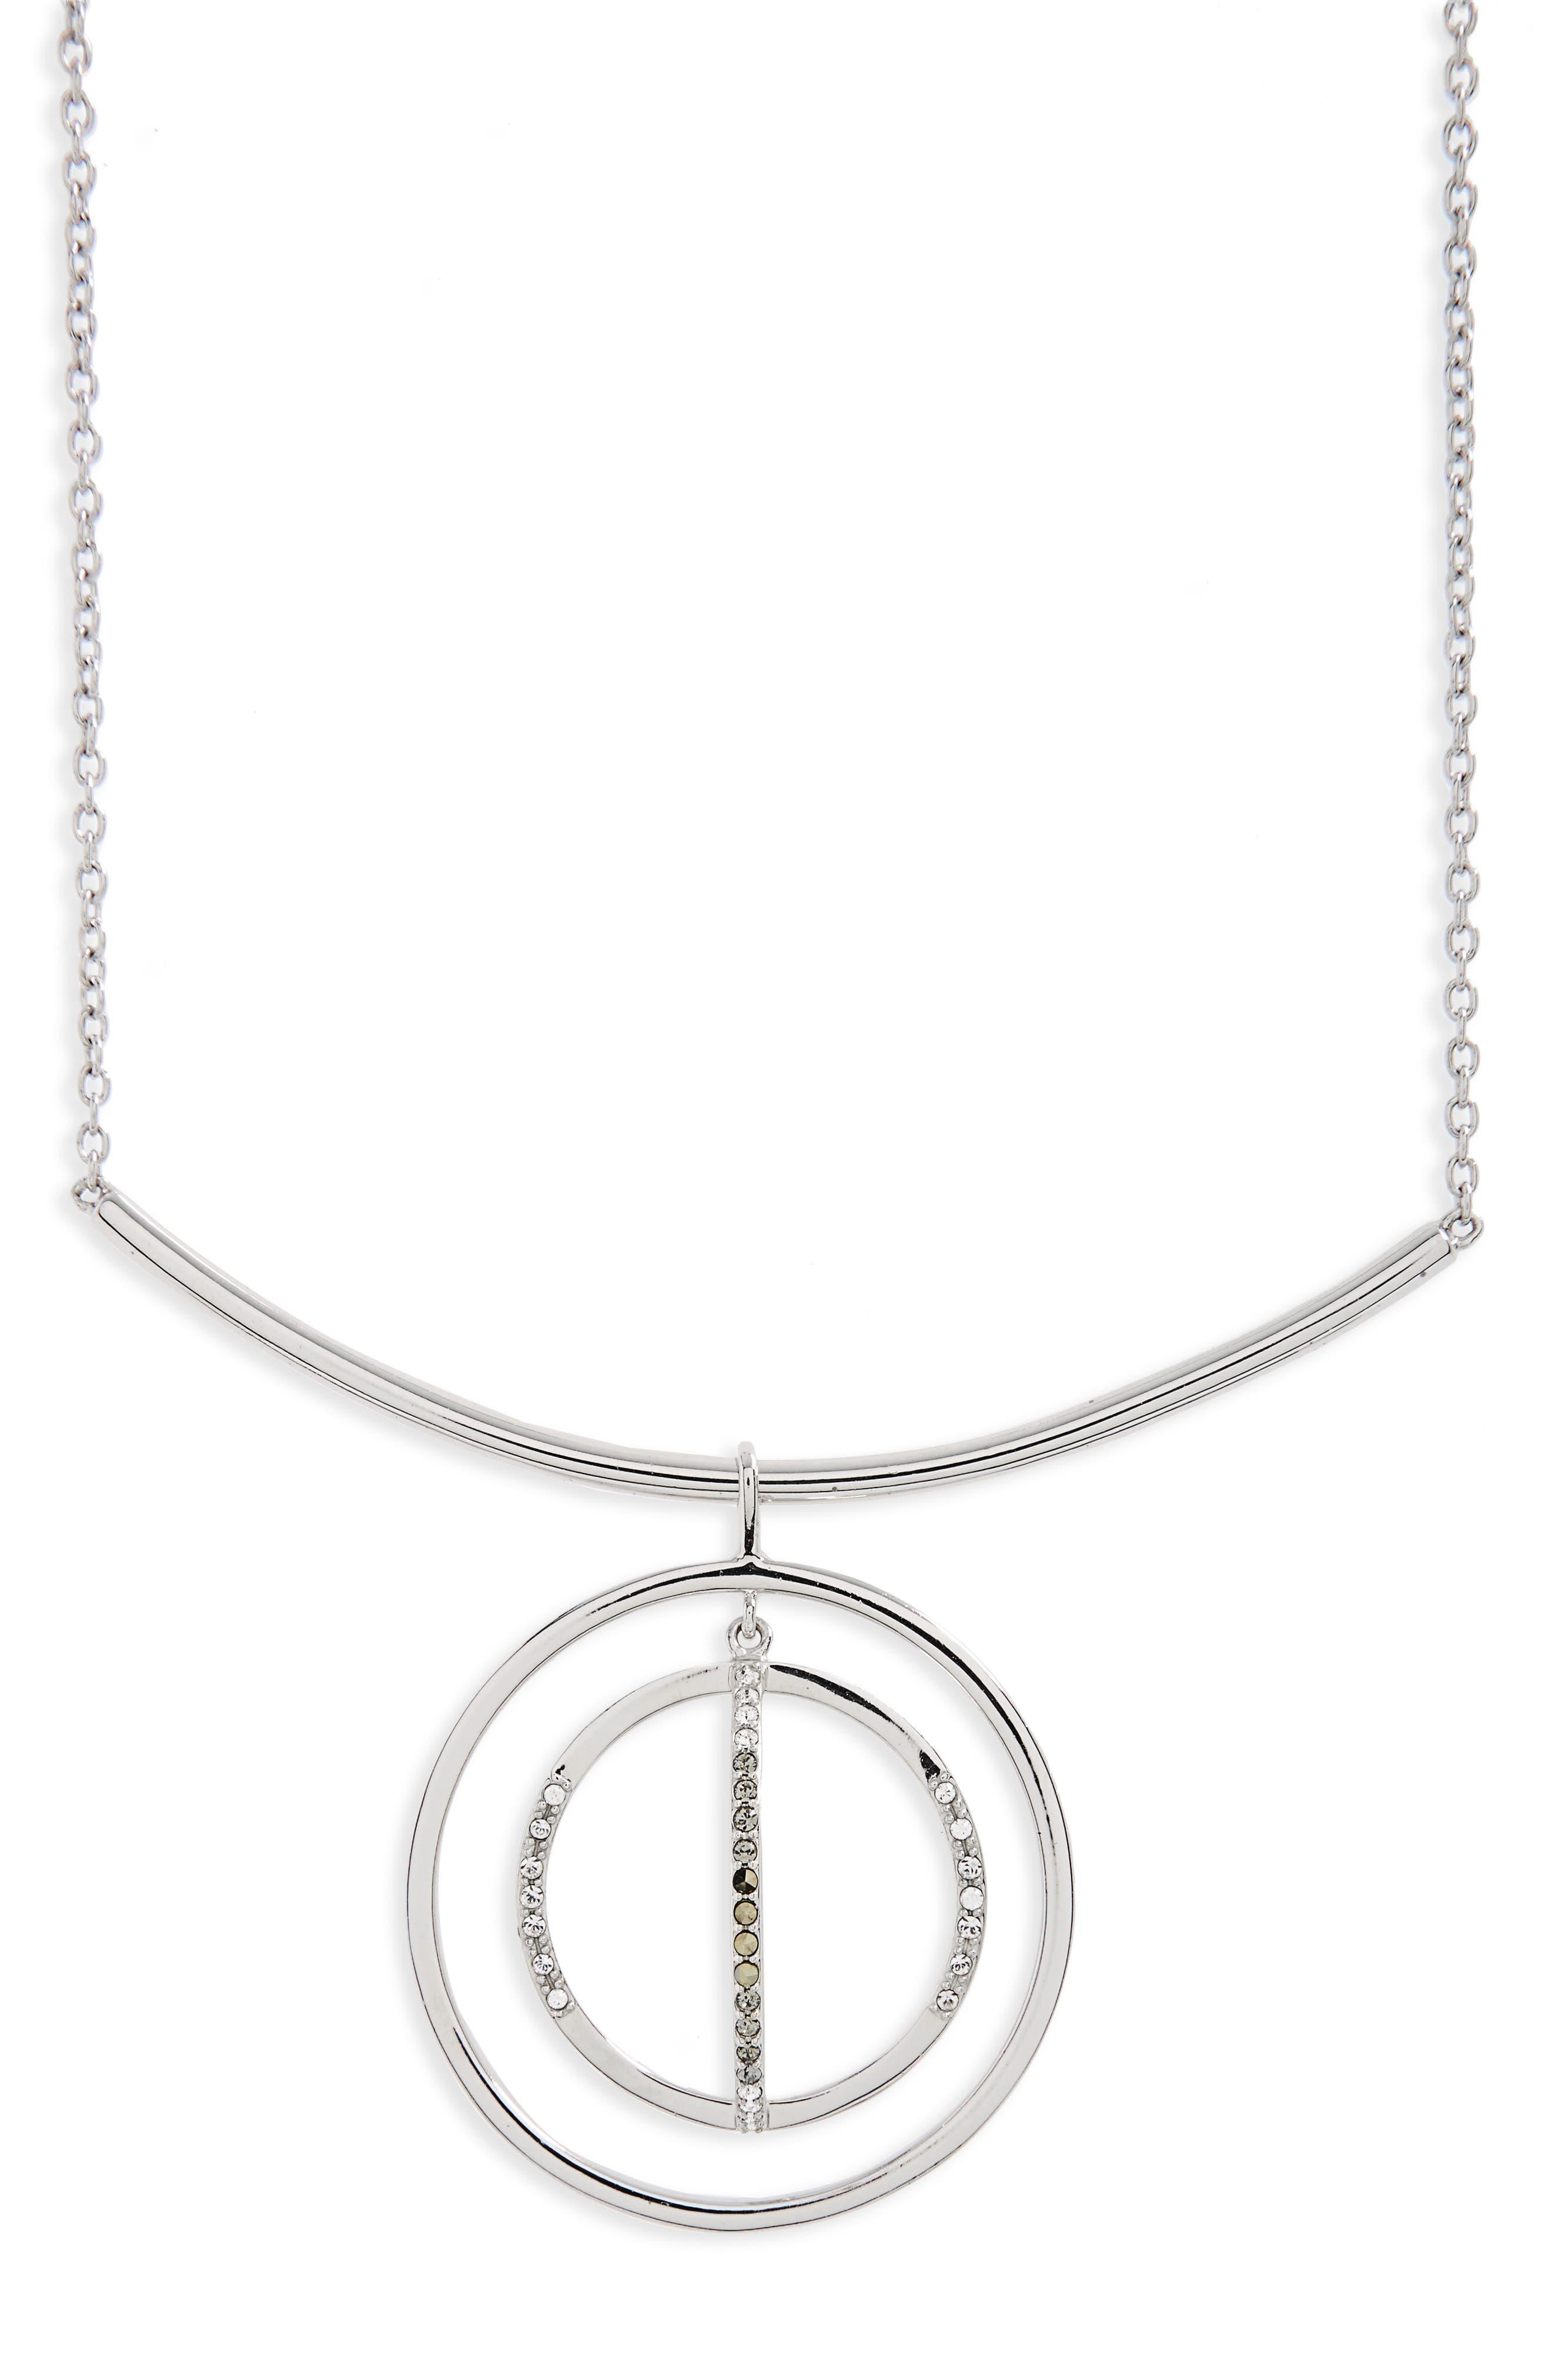 Silver Sparkle Circle Pendant Necklace,                         Main,                         color, Black Diamond/ Marcasite